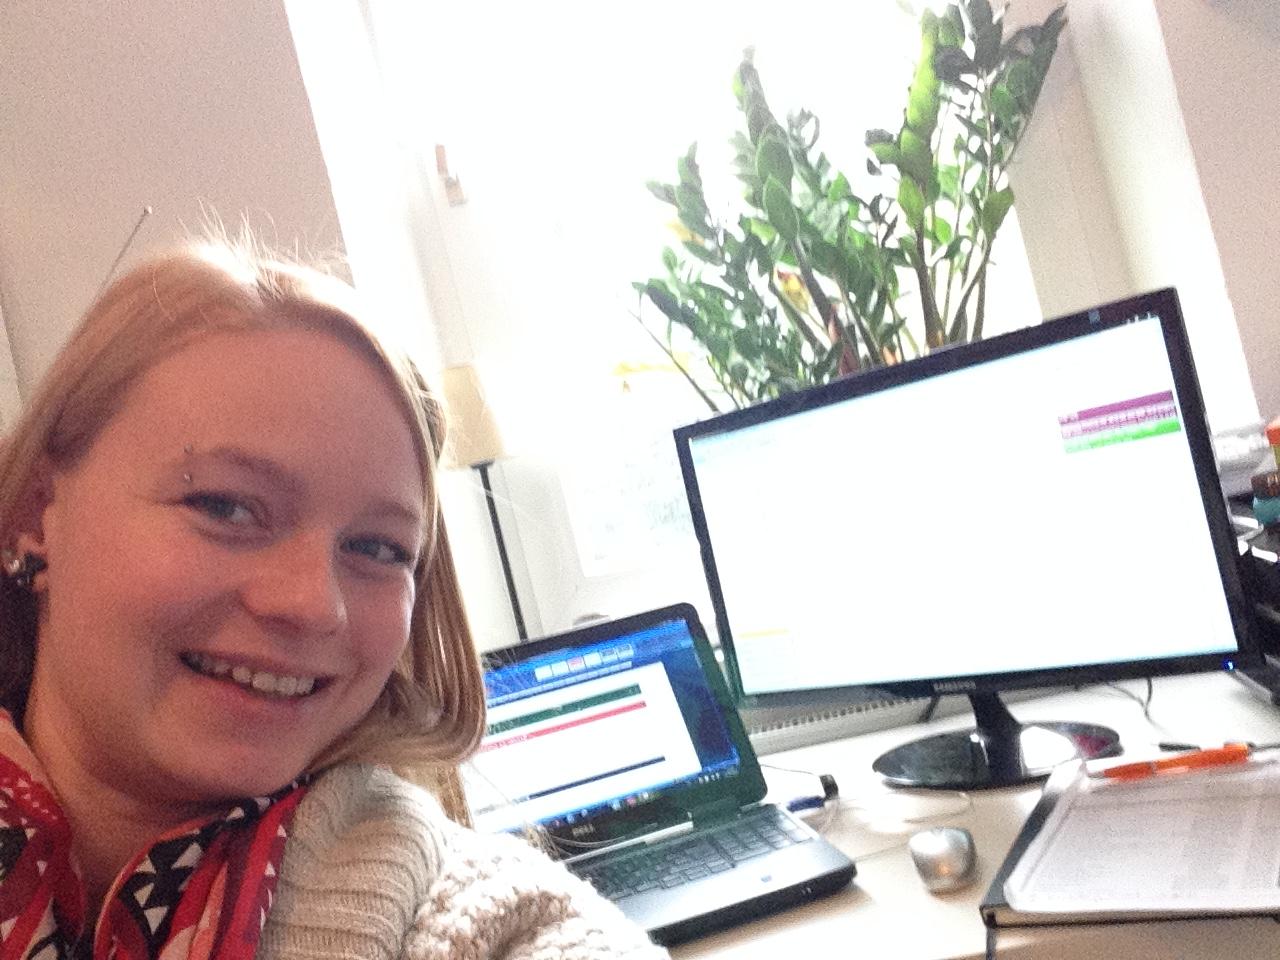 Nationaler Home-Office-Day: vibrio zuhause - DampfLog